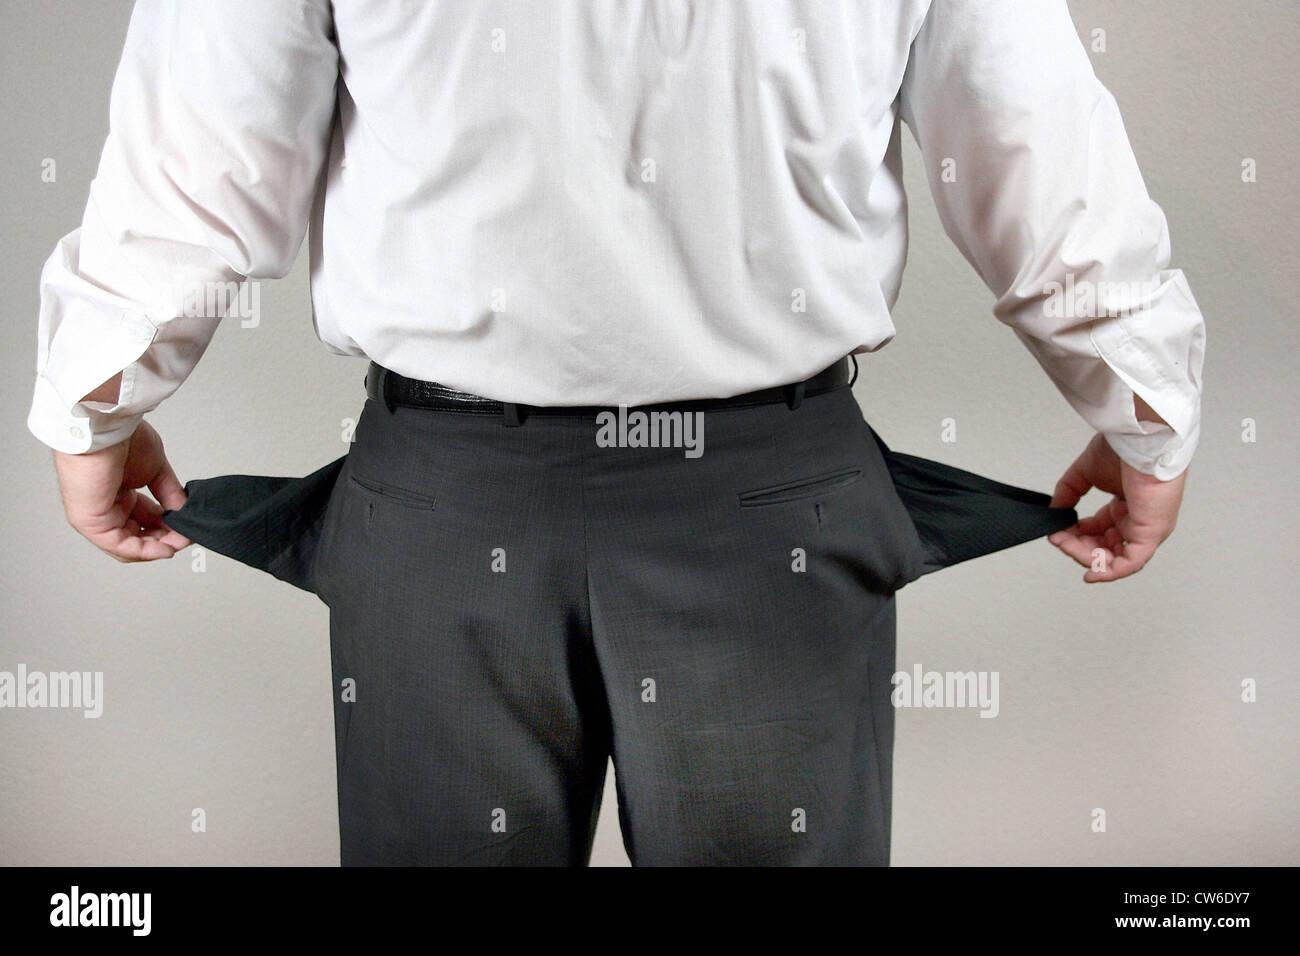 Presse à pantalons poches vides Photo Stock